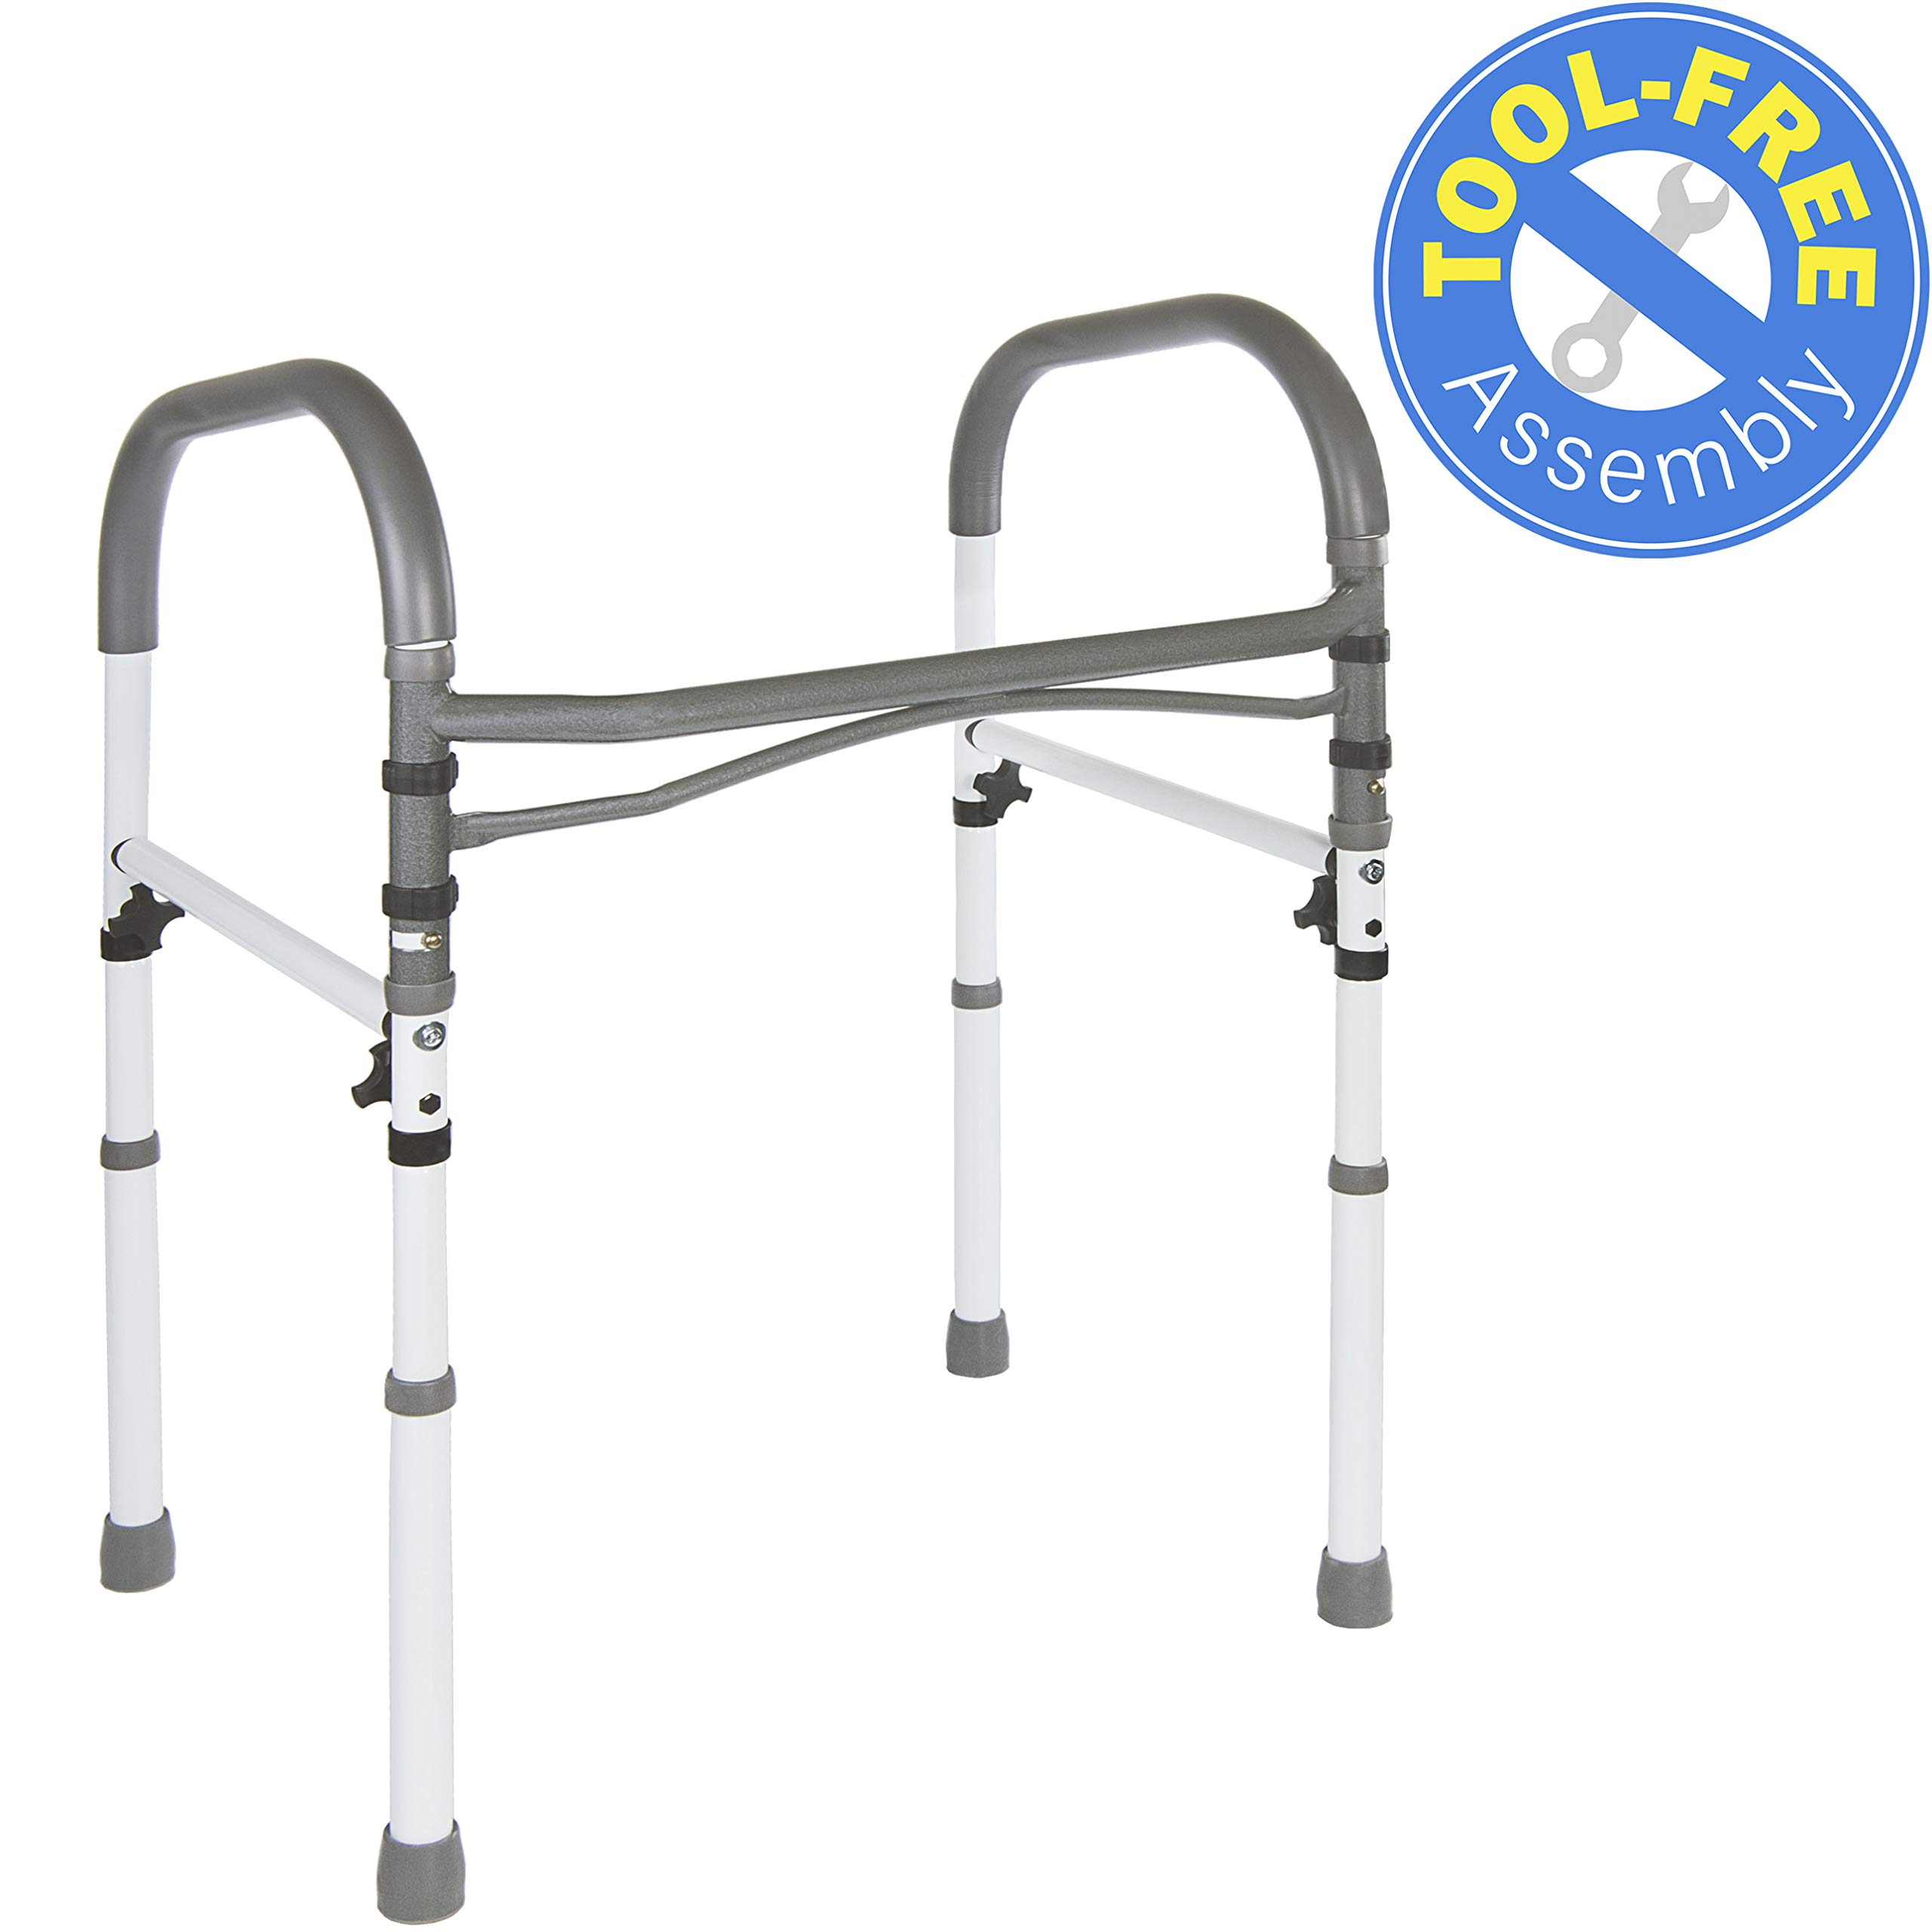 Vaunn Deluxe Bathroom Safety Toilet Rail - Adjustable Toilet Safety Frame - Medical Handrail Assist Grab bar Handle by Vaunn